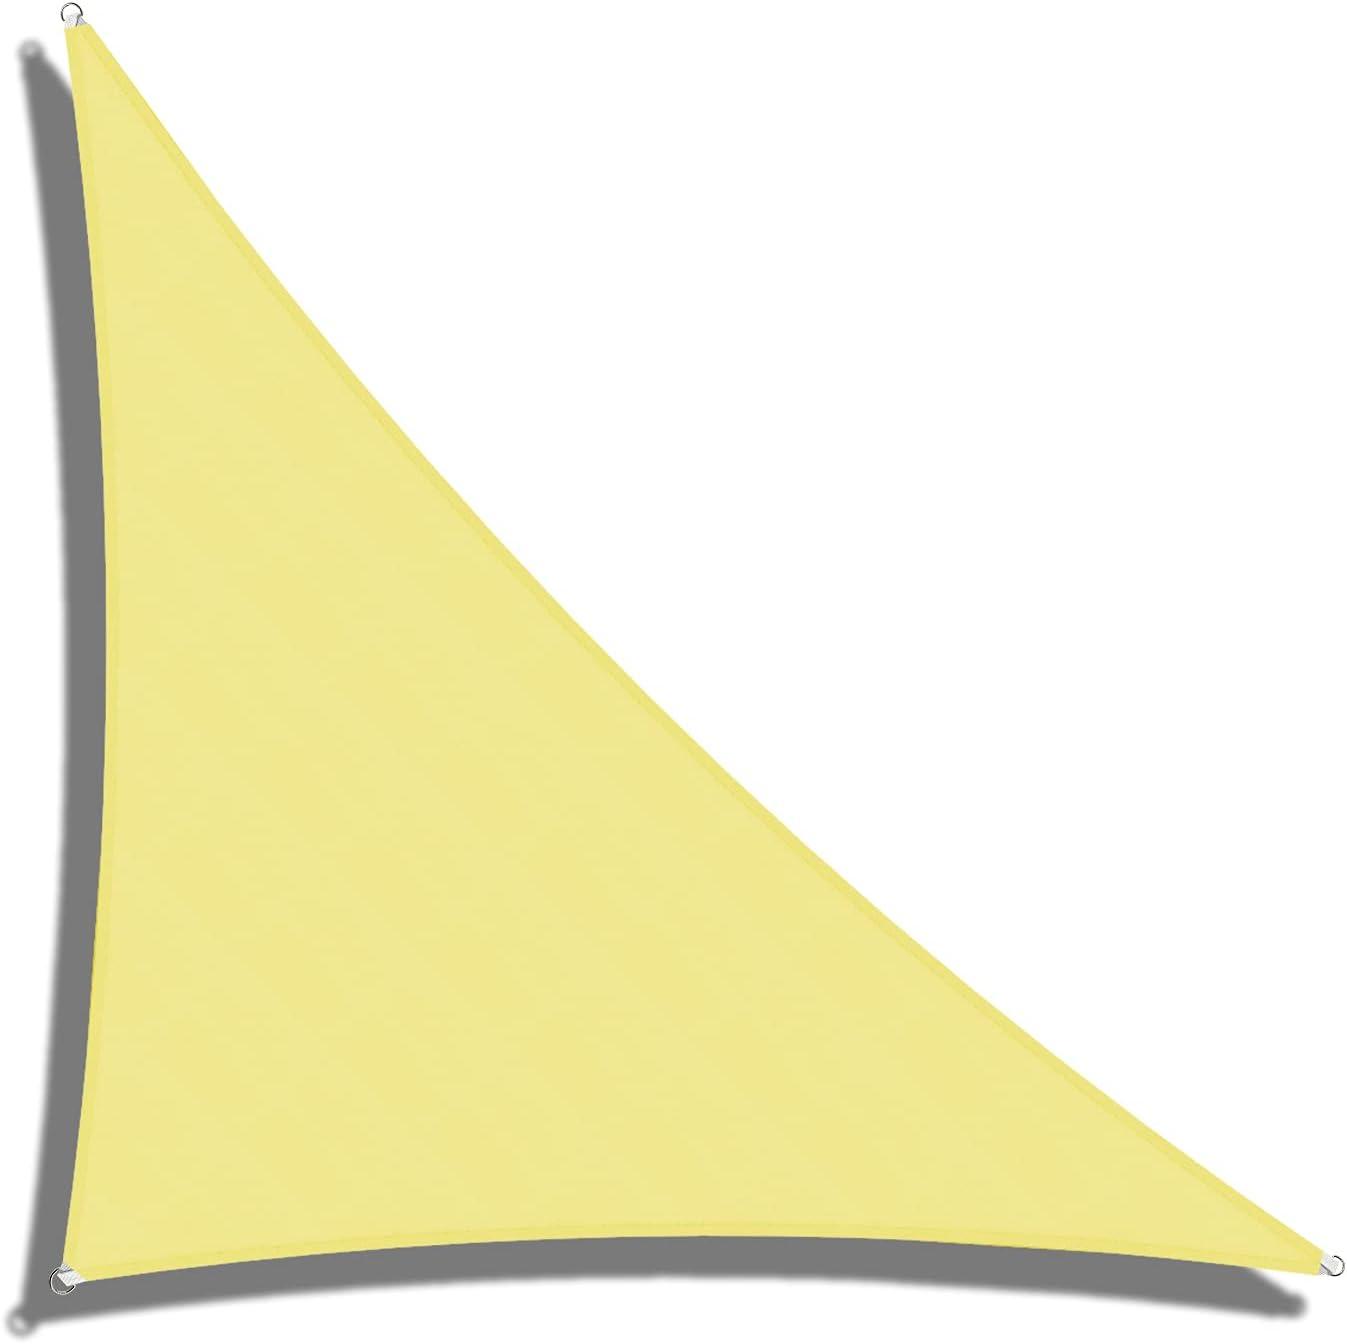 Coarbor 12' x 17' 5☆大好評 Triangle Light Sun Waterproof Yellow Sha バースデー 記念日 ギフト 贈物 お勧め 通販